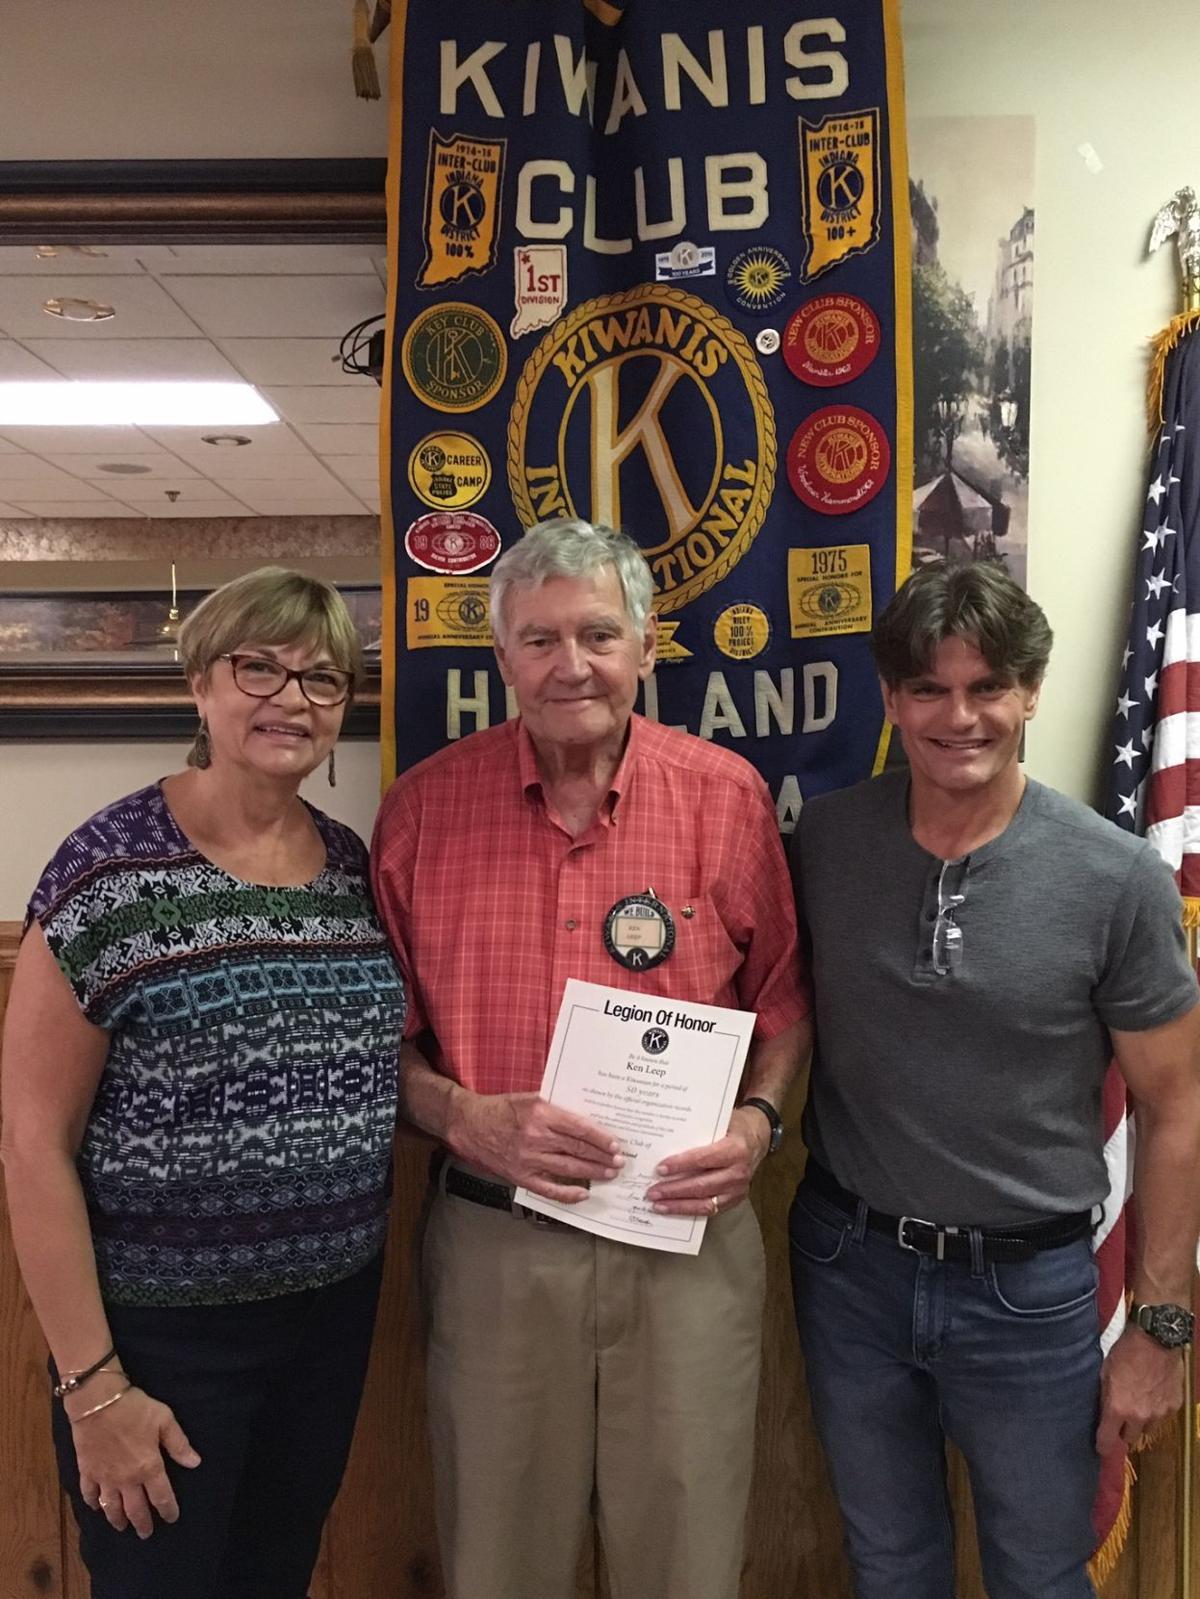 Ken Leep celebrates 50 years as a Highland Kiwanian